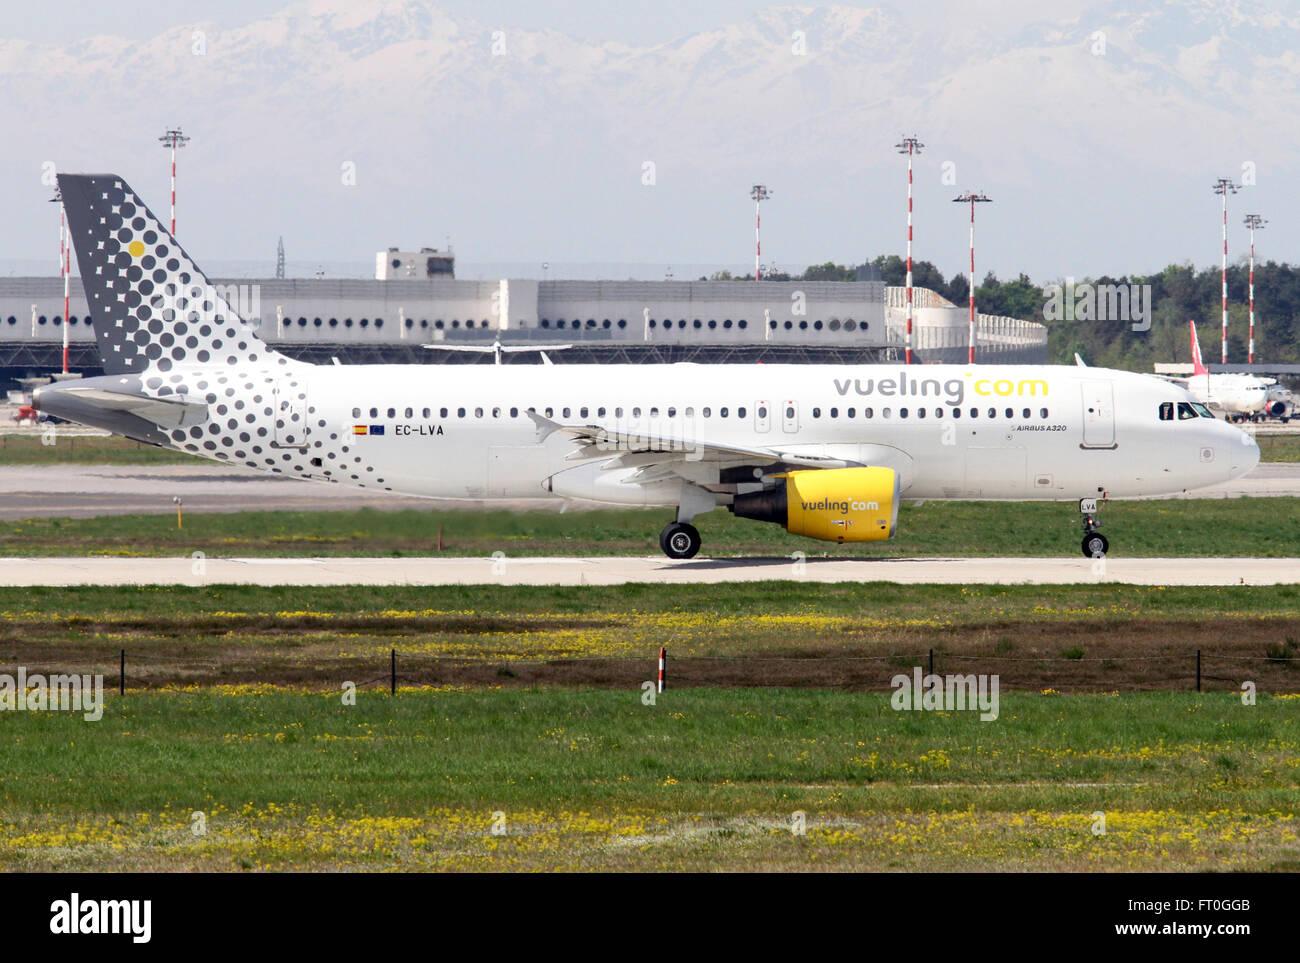 EC-LVA Vueling Airbus A320-200 - Stock Image